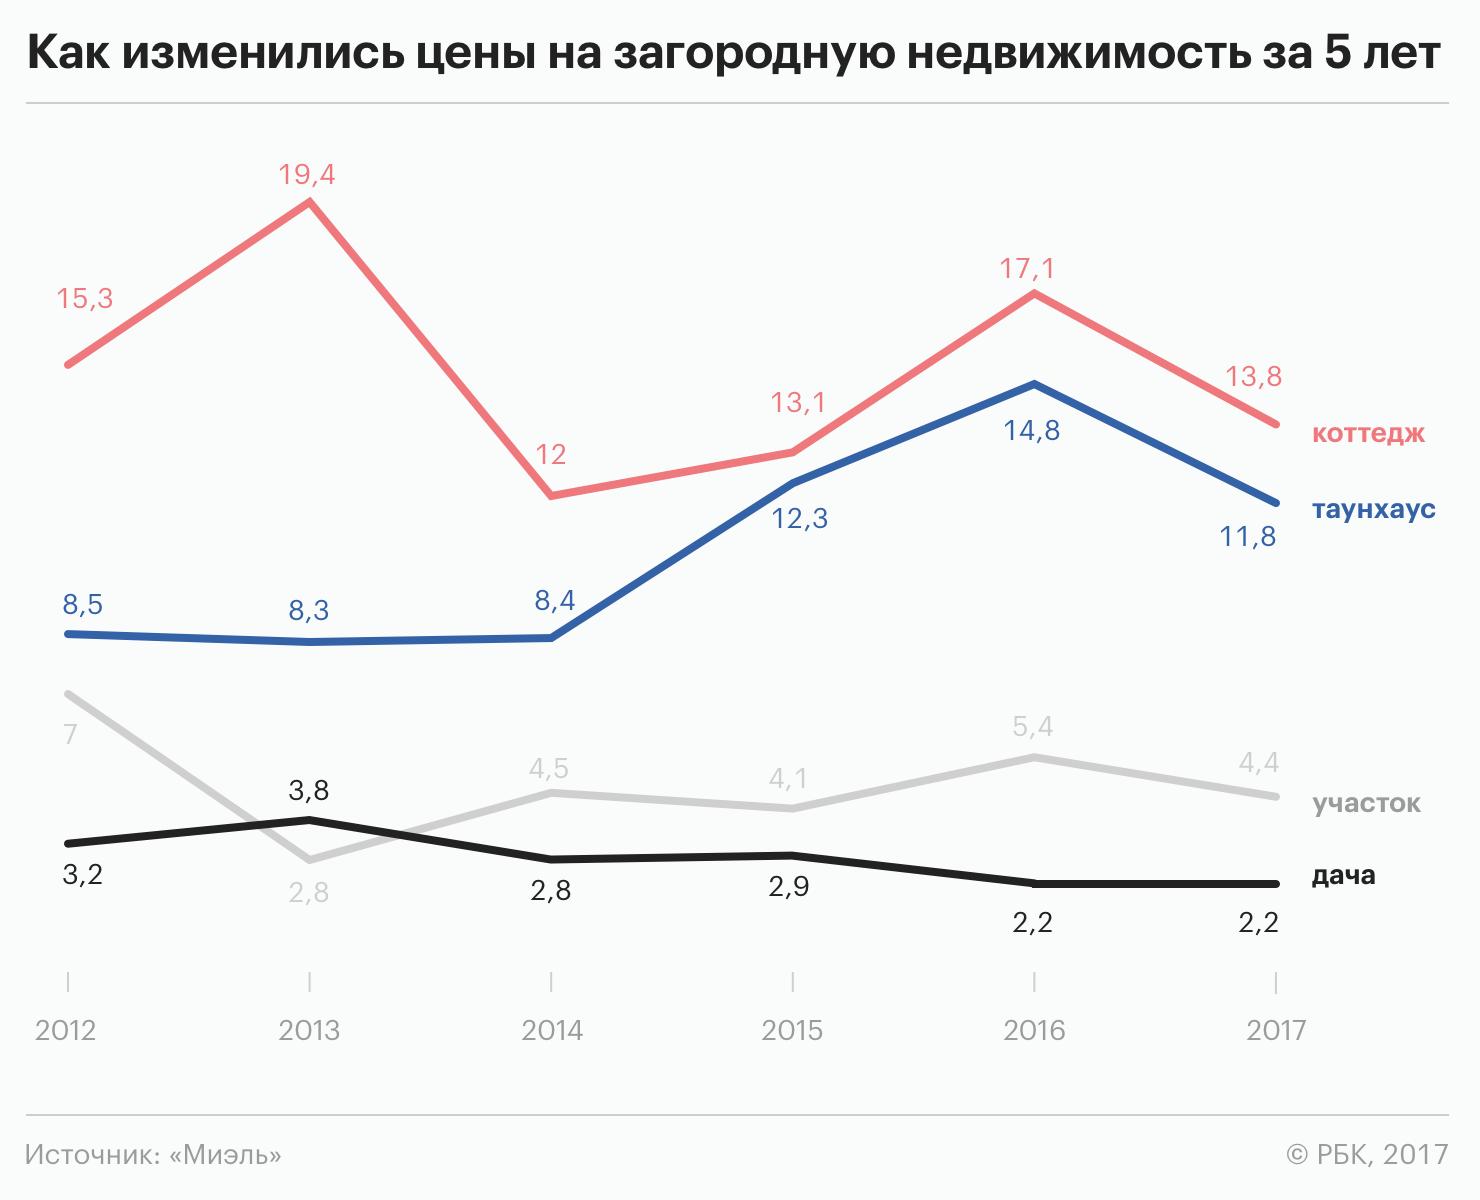 https://s0.rbk.ru/v6_top_pics/media/img/6/04/755081549253046.png